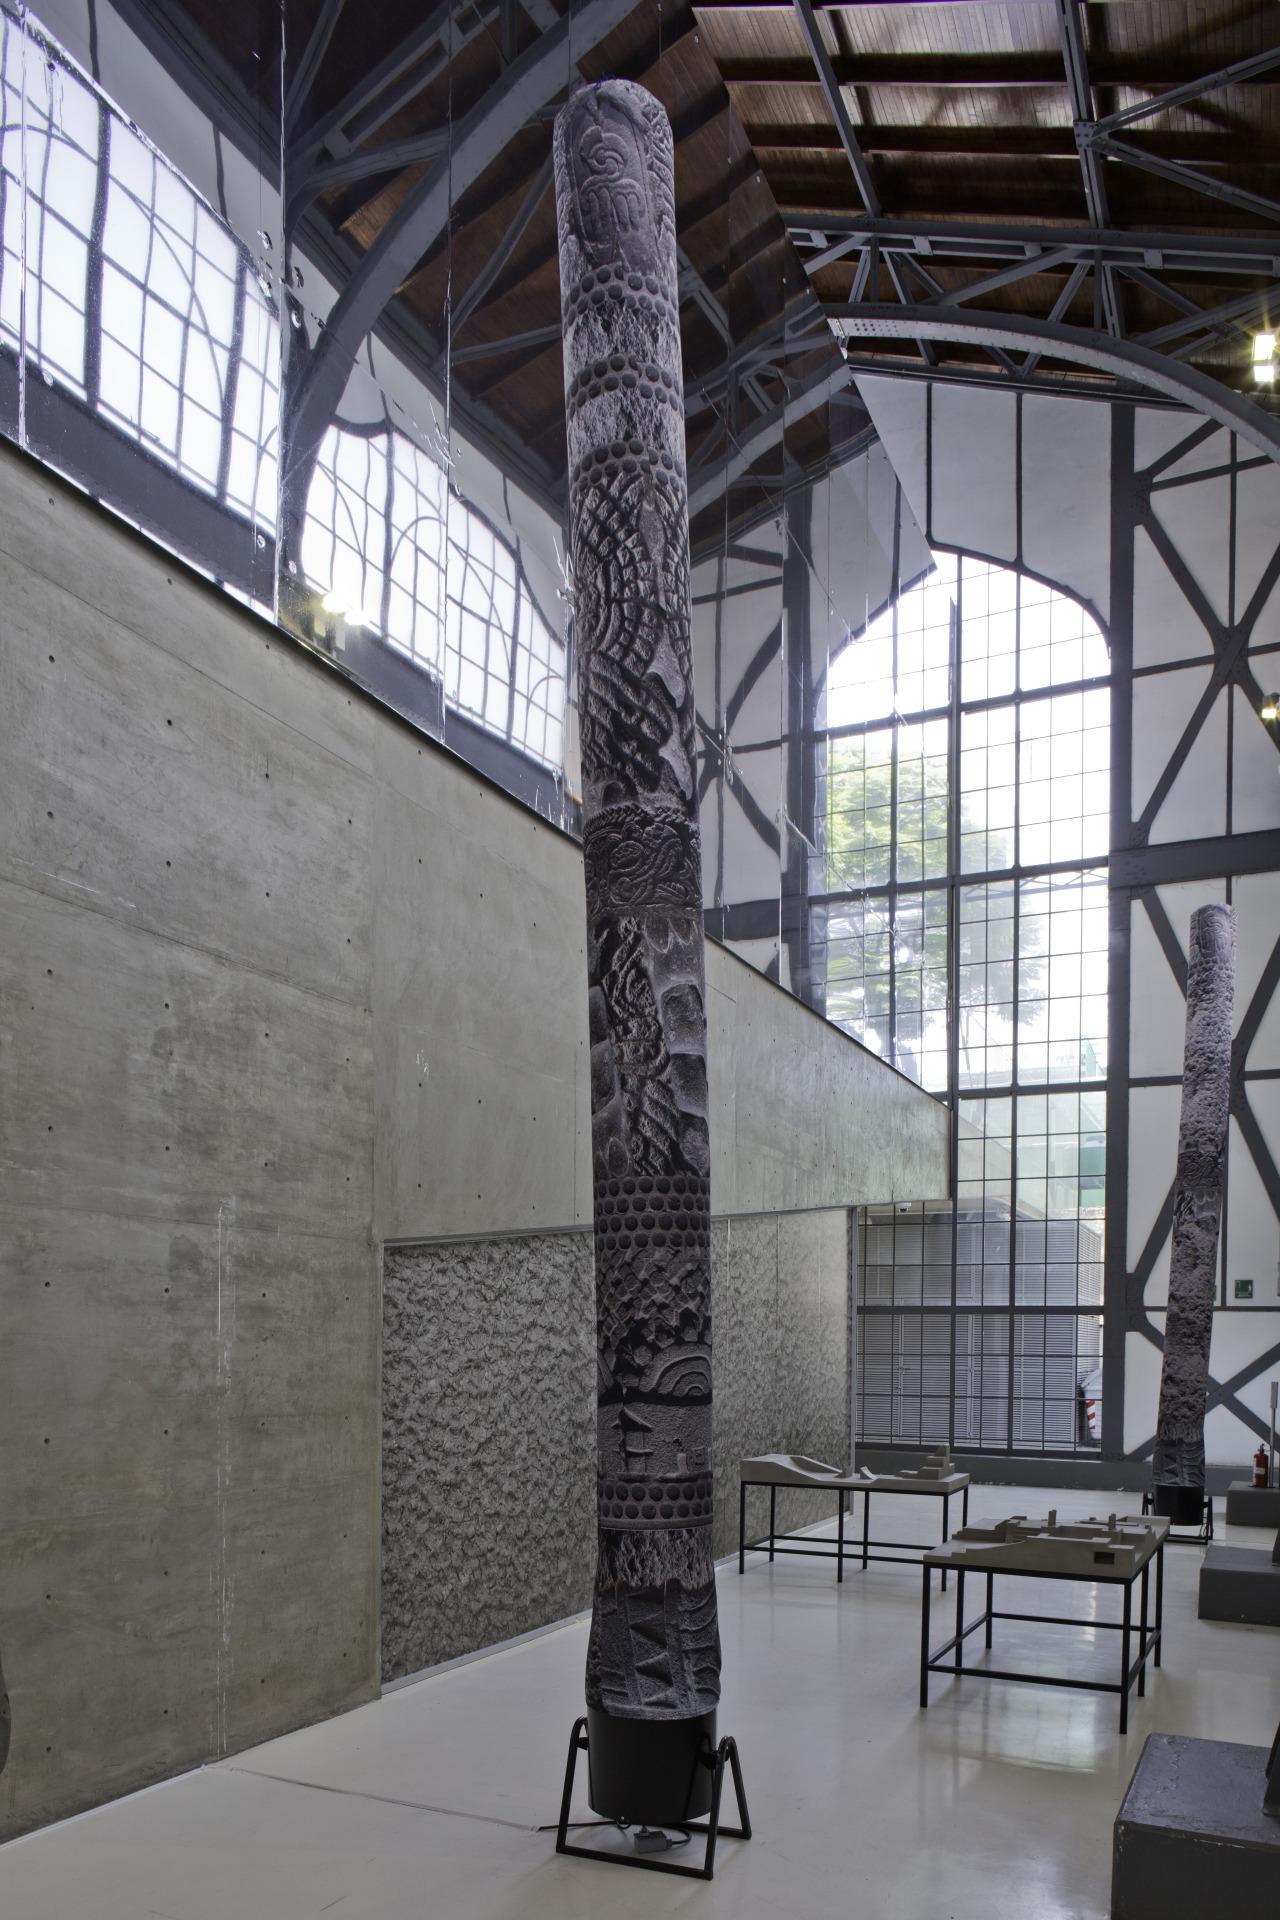 Installation view of SANGREE's 'Murmurs of Earth' at the Museo Universitario del Chopo